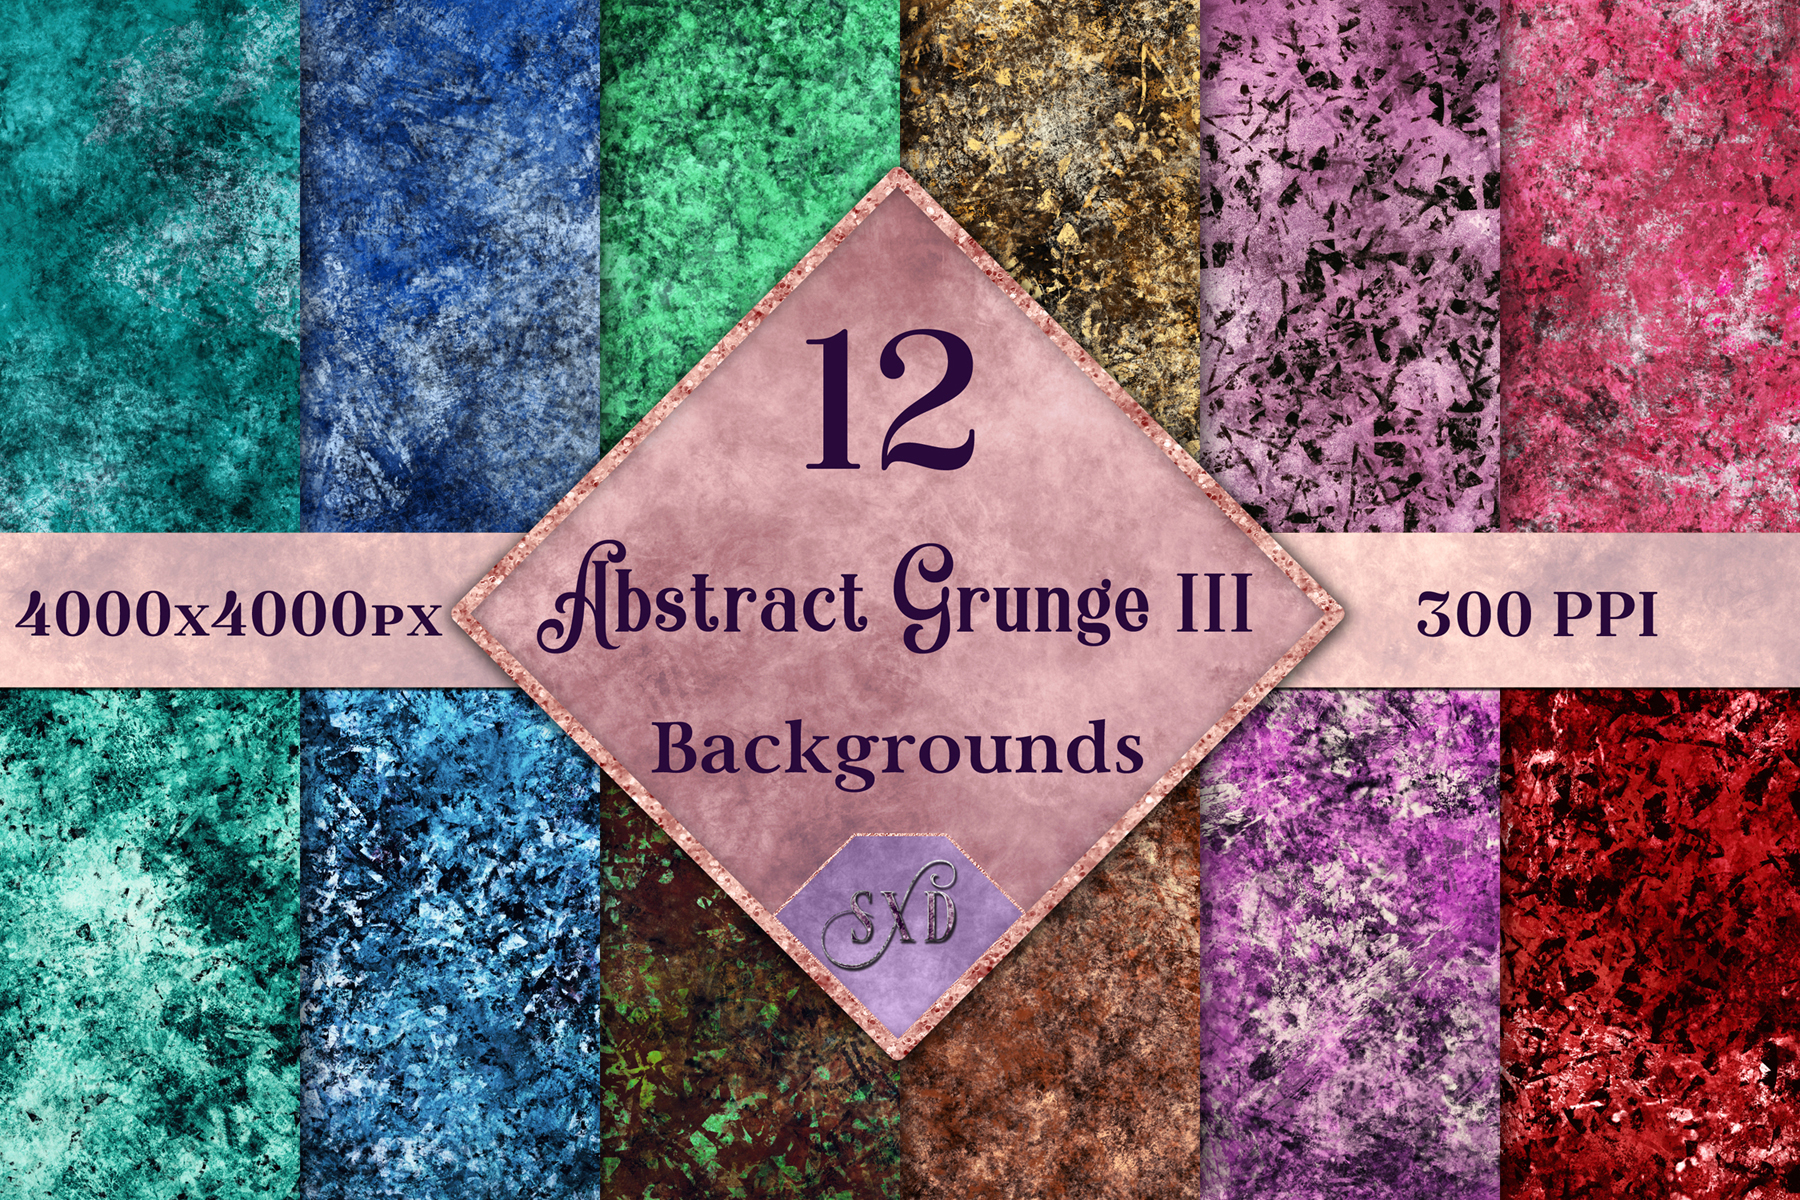 Abstract Grunge III Backgrounds - 12 Image Textures Set example image 1